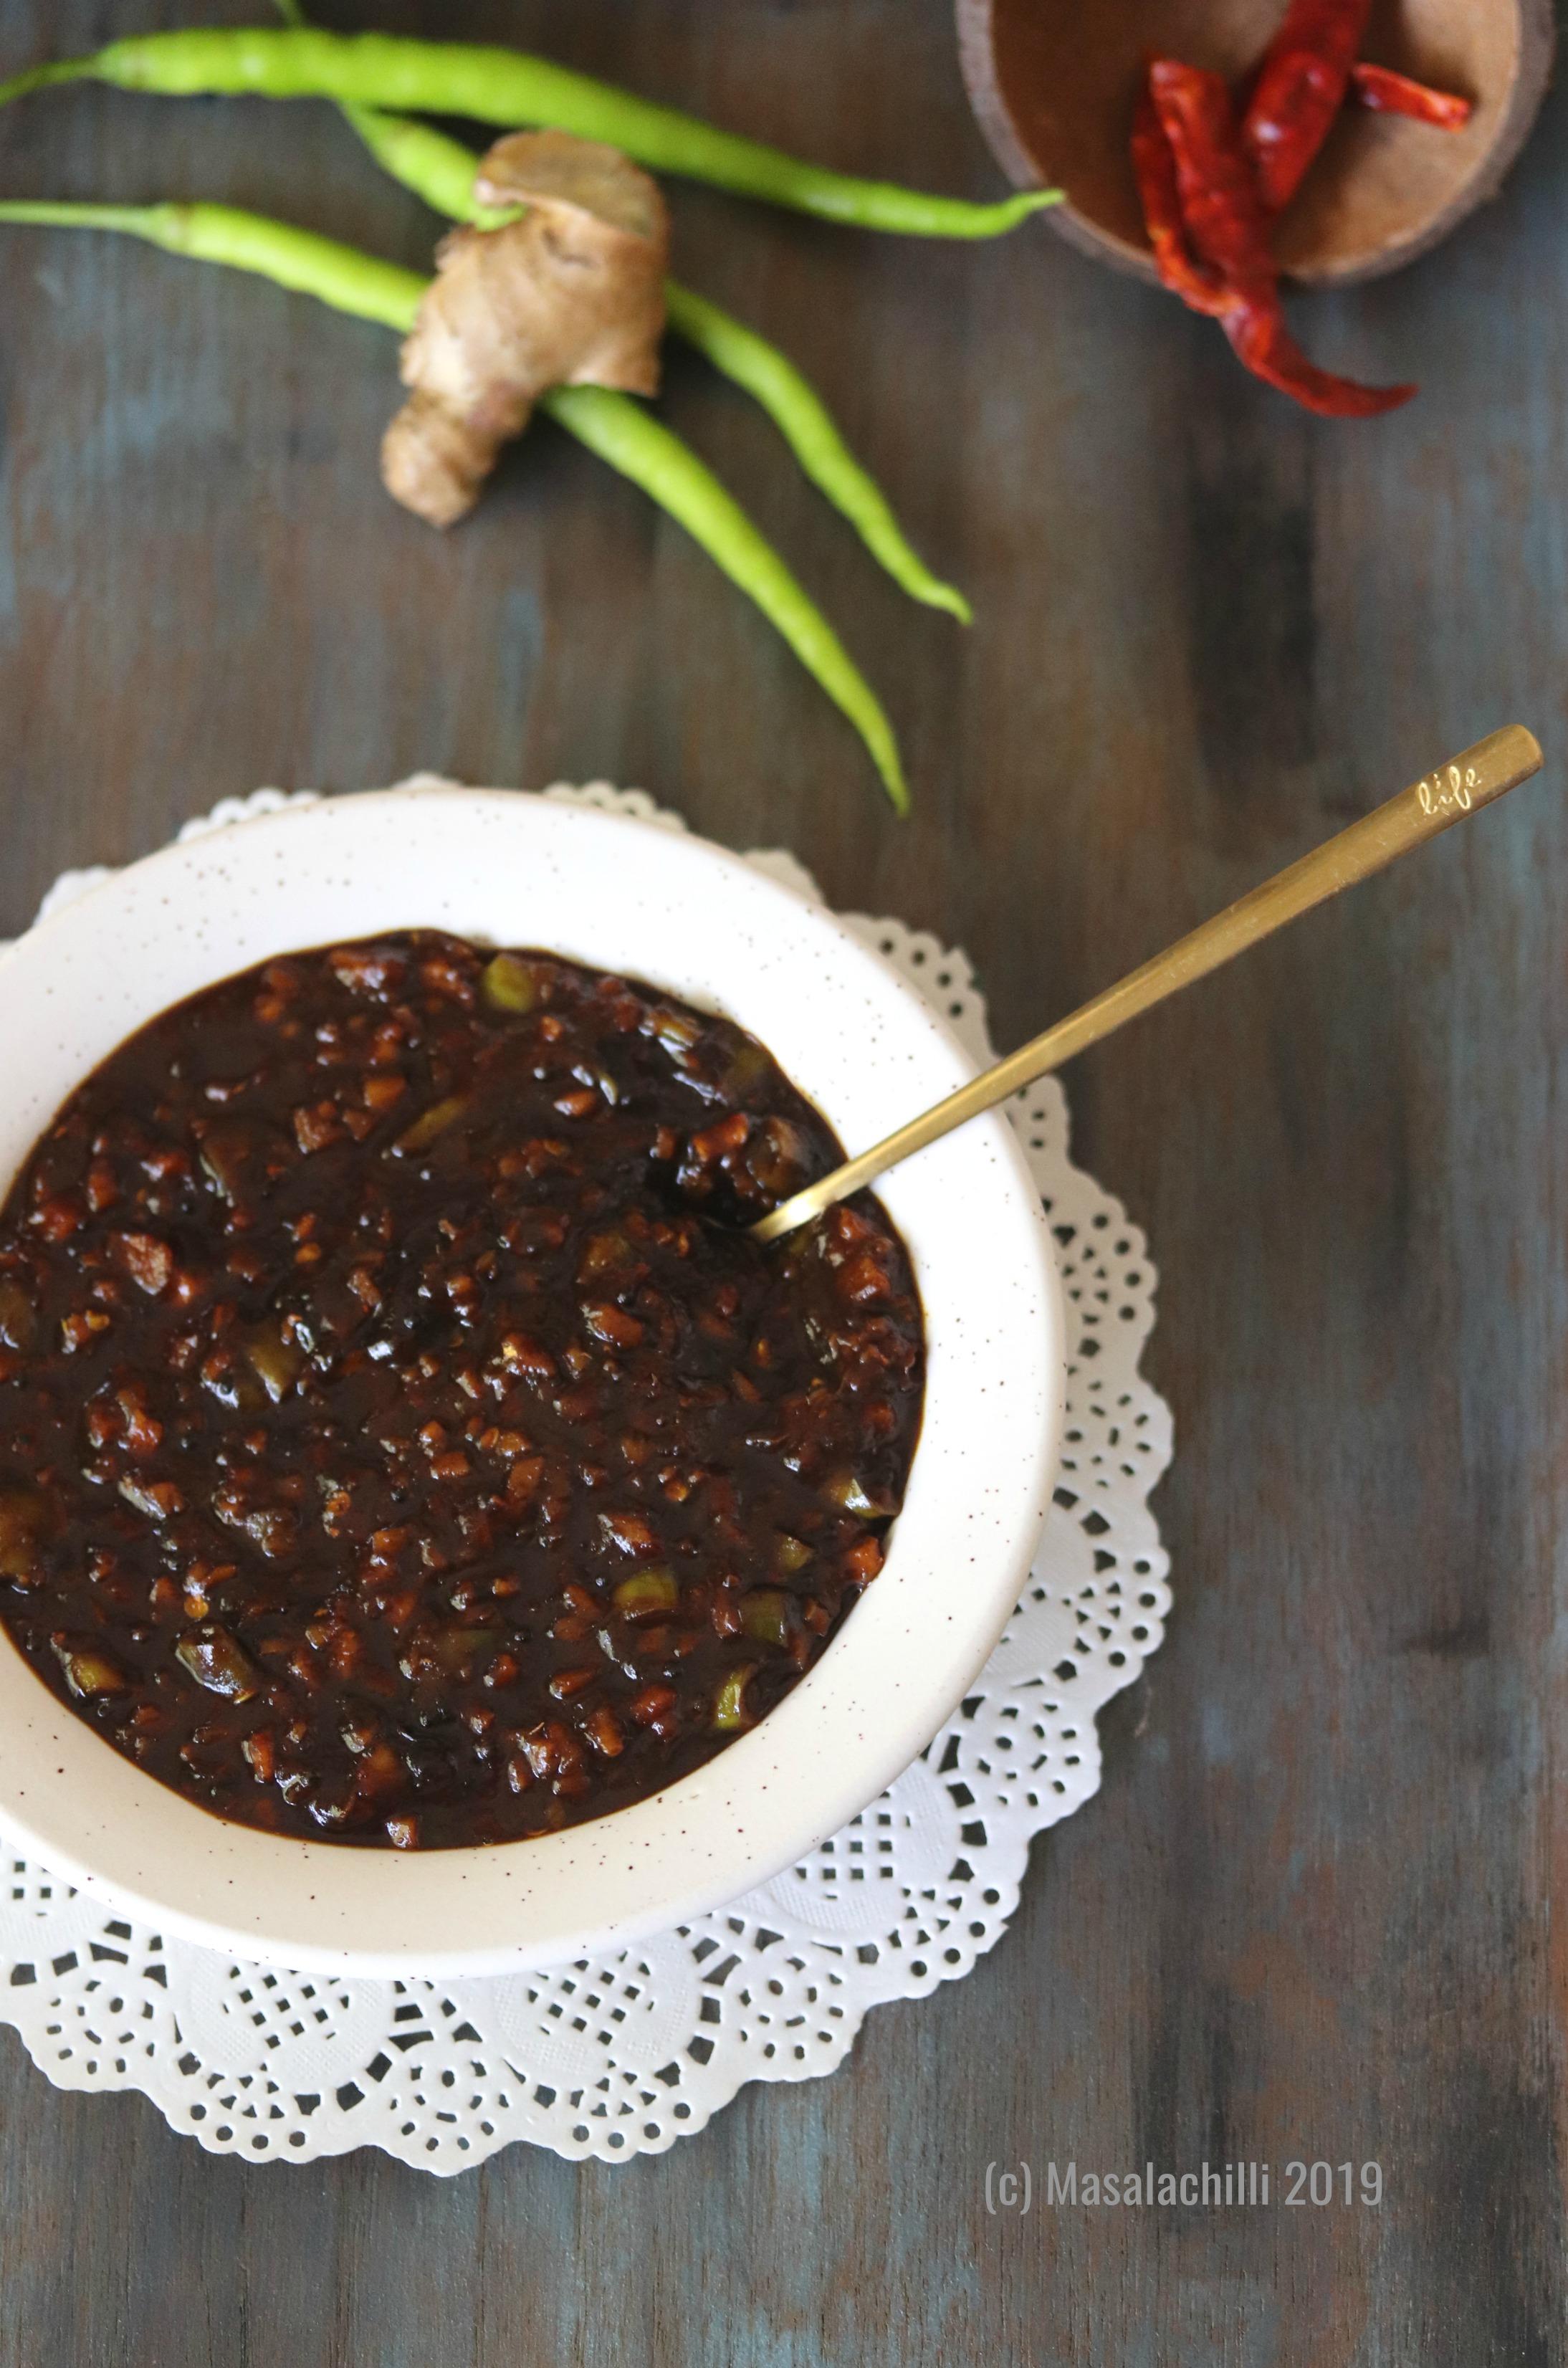 Puli Inji / Kerala Sweet and Sour Ginger Pickle for Sadya